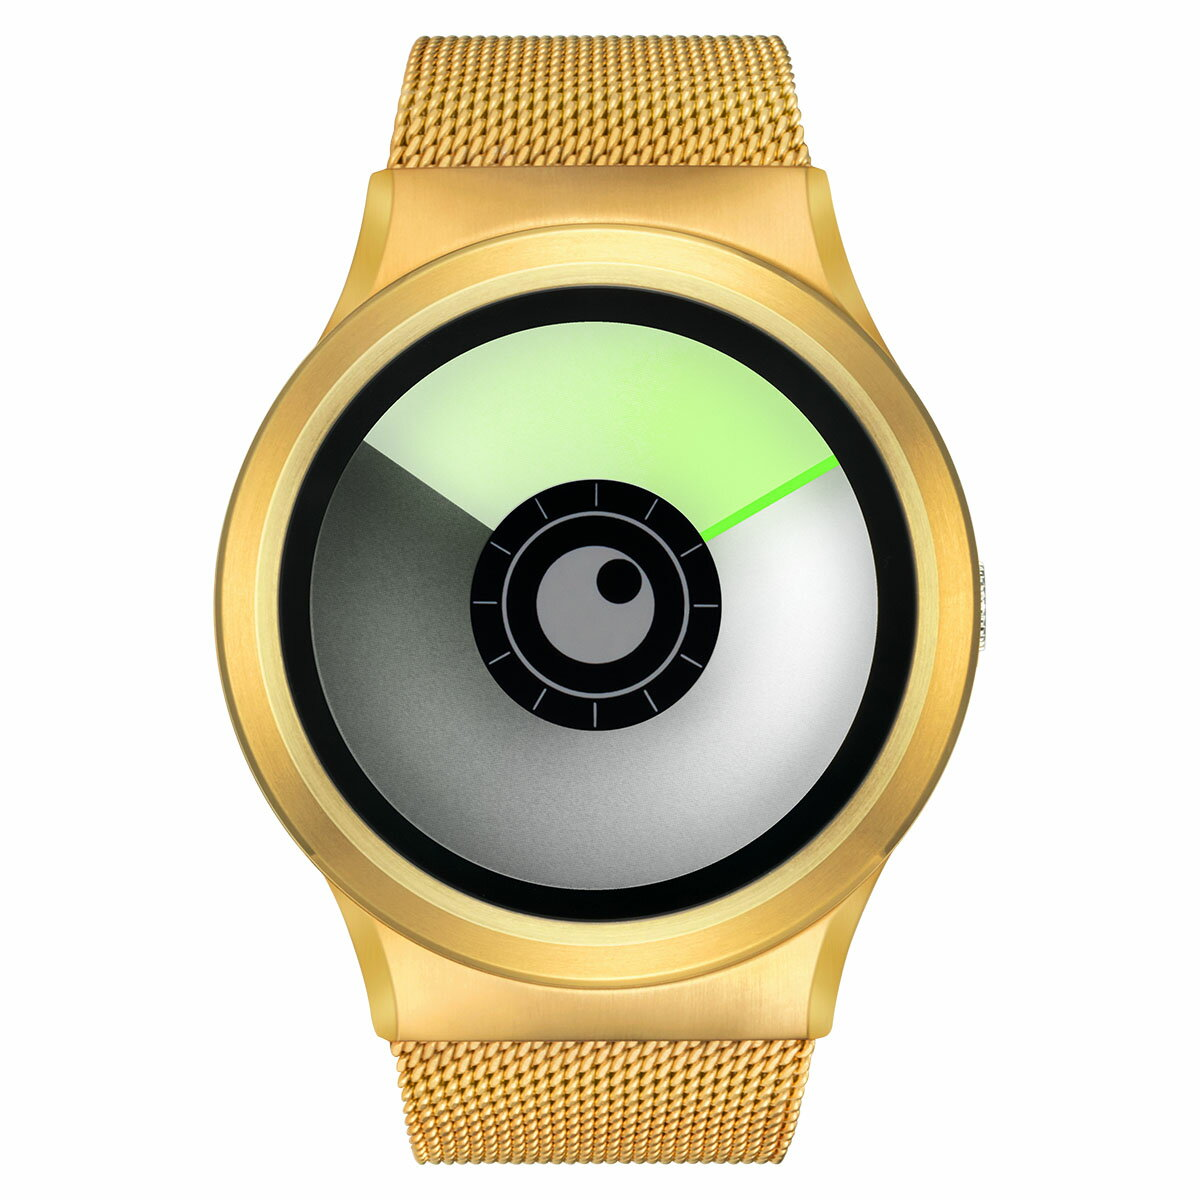 ZEROO AURORA BOREALIS ゼロ 電池式クォーツ 腕時計 [W12022B04SM04] グリーン デザインウォッチ ペア用 メンズ レディース ユニセックス おしゃれ時計 デザイナーズ